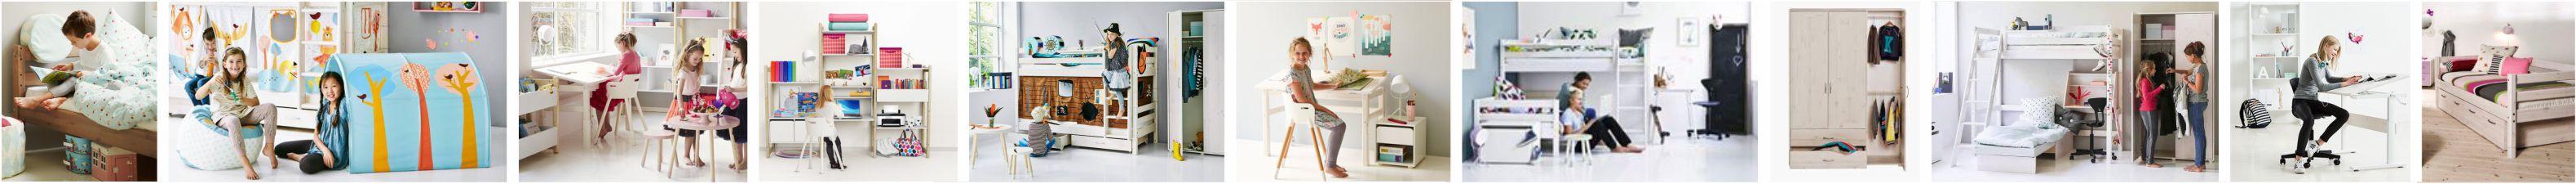 Flexa moduliniai baldai baldai jaunuolio ir vaikams.  Flexa  lovos vaikams ir jaunuoliams. Flexa baldų komplektai vaiko kambariui.